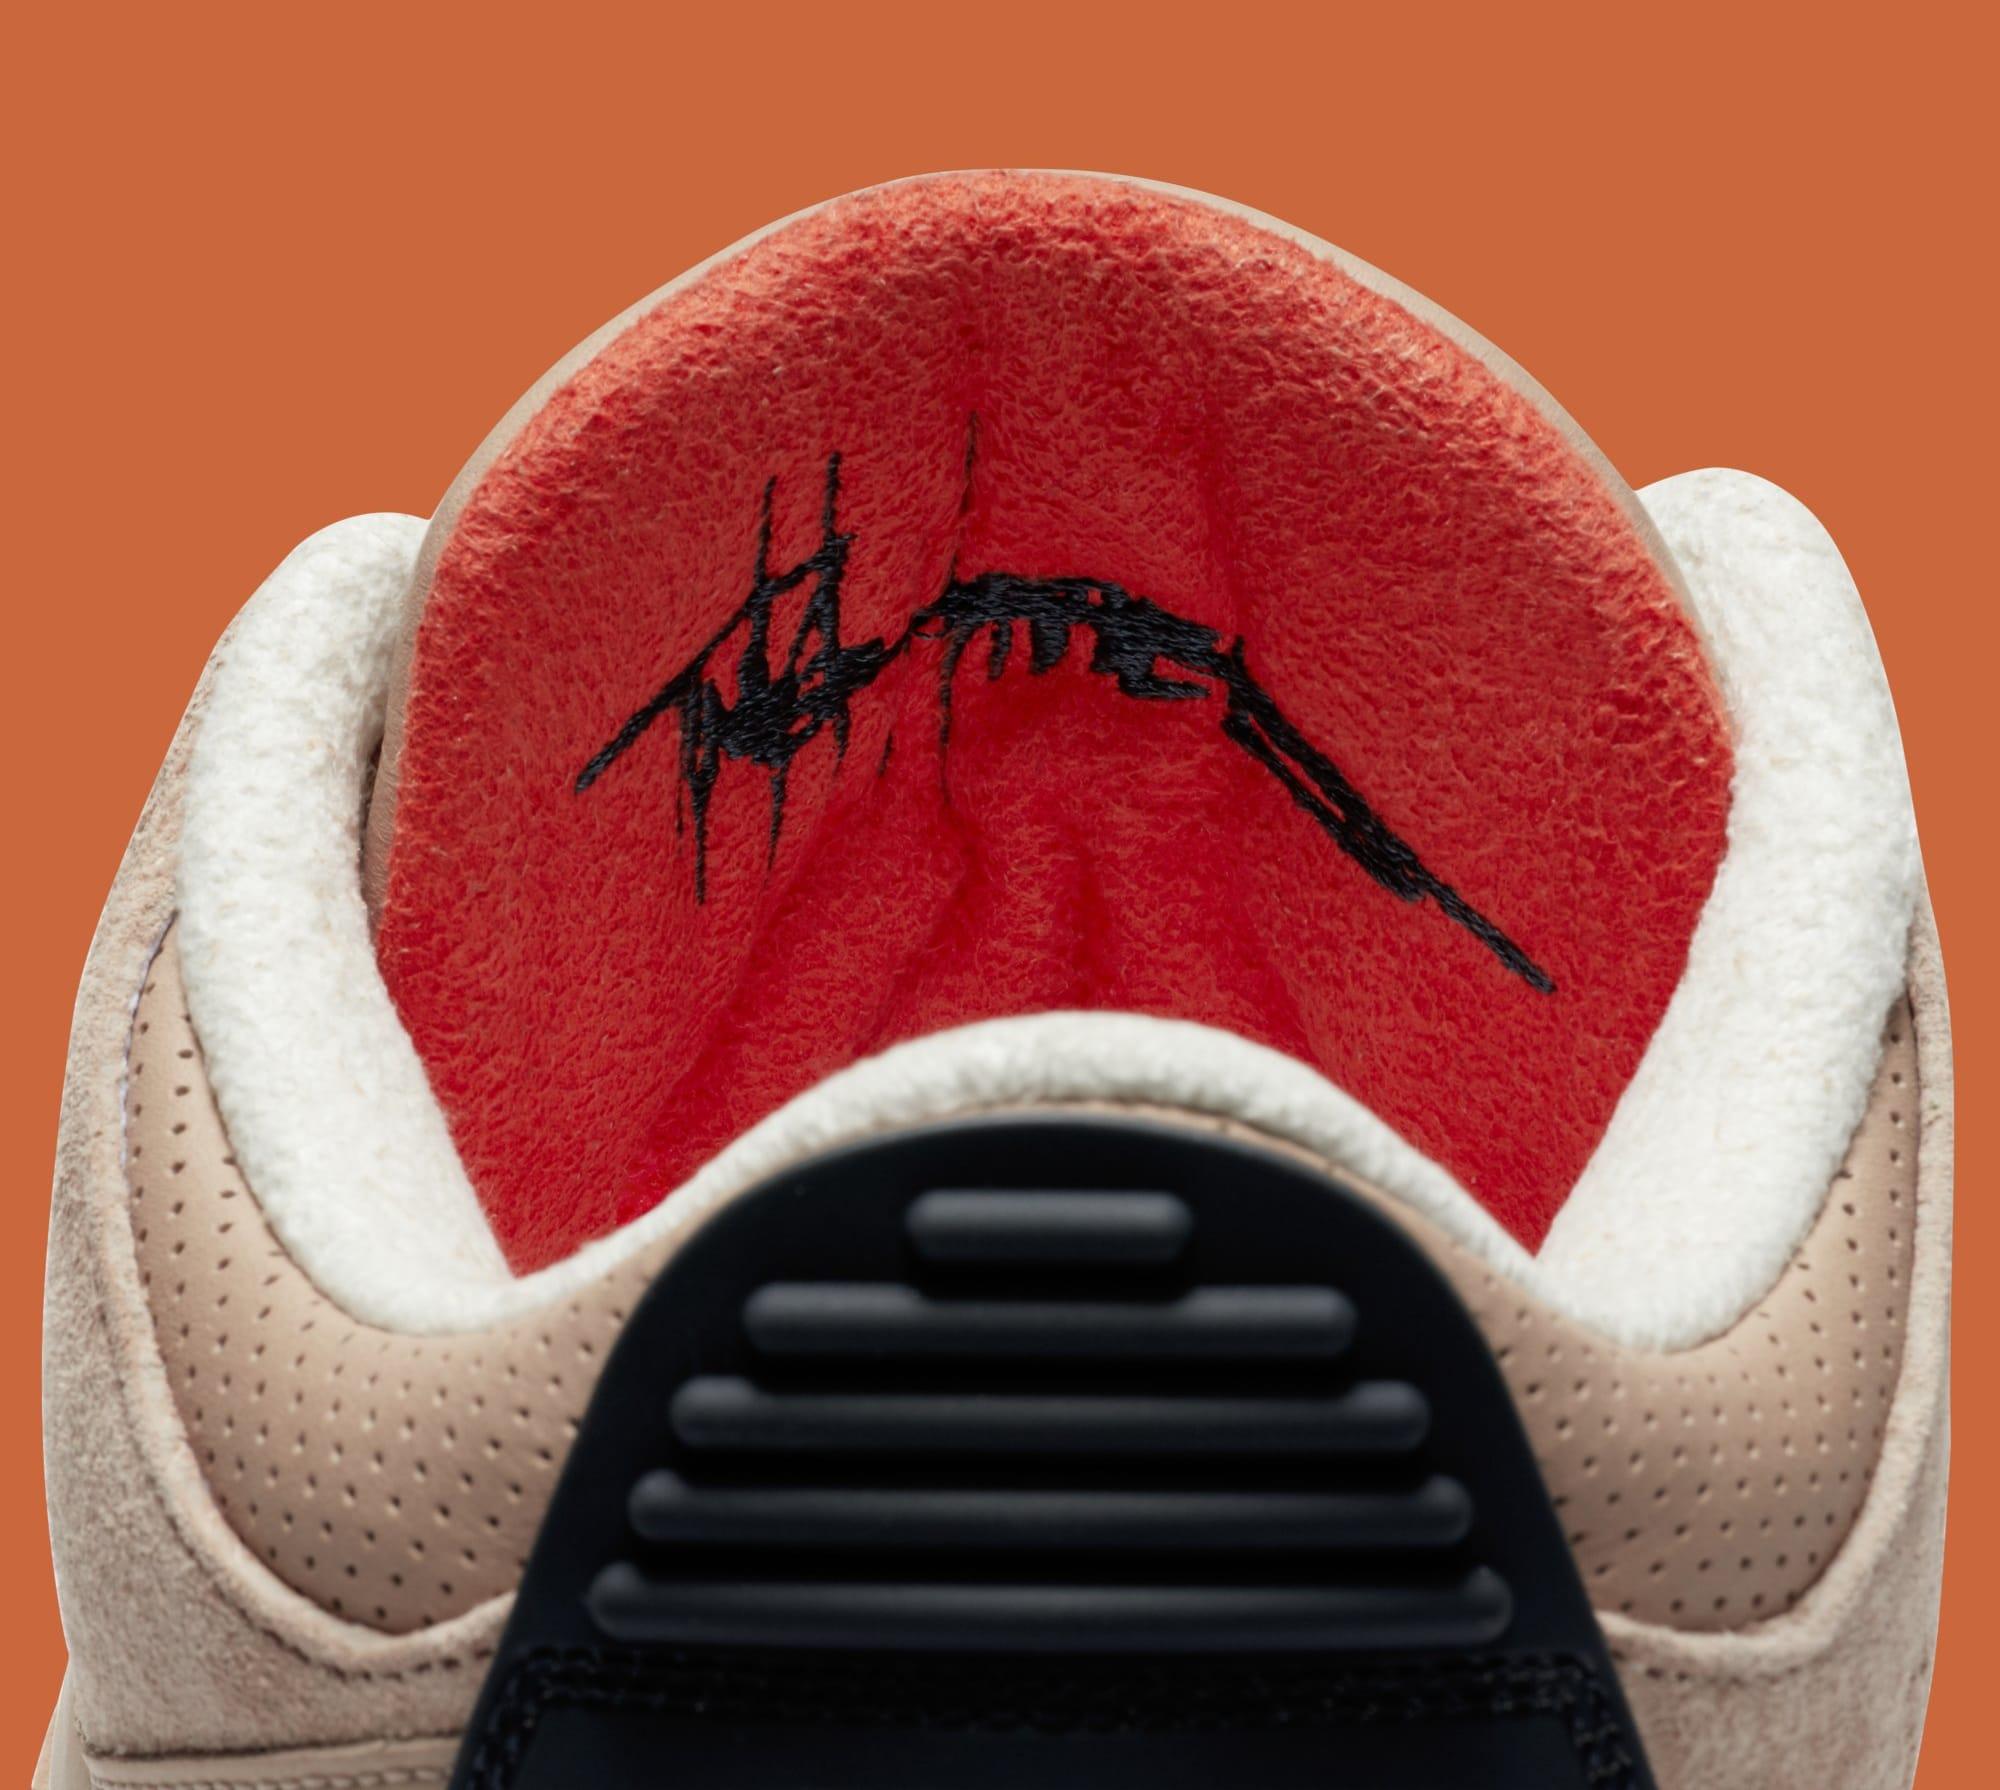 Justin Timberlake x Air Jordan 3 JTH NRG 'Bio Beige' AV6683-200 (Tongue Detail)